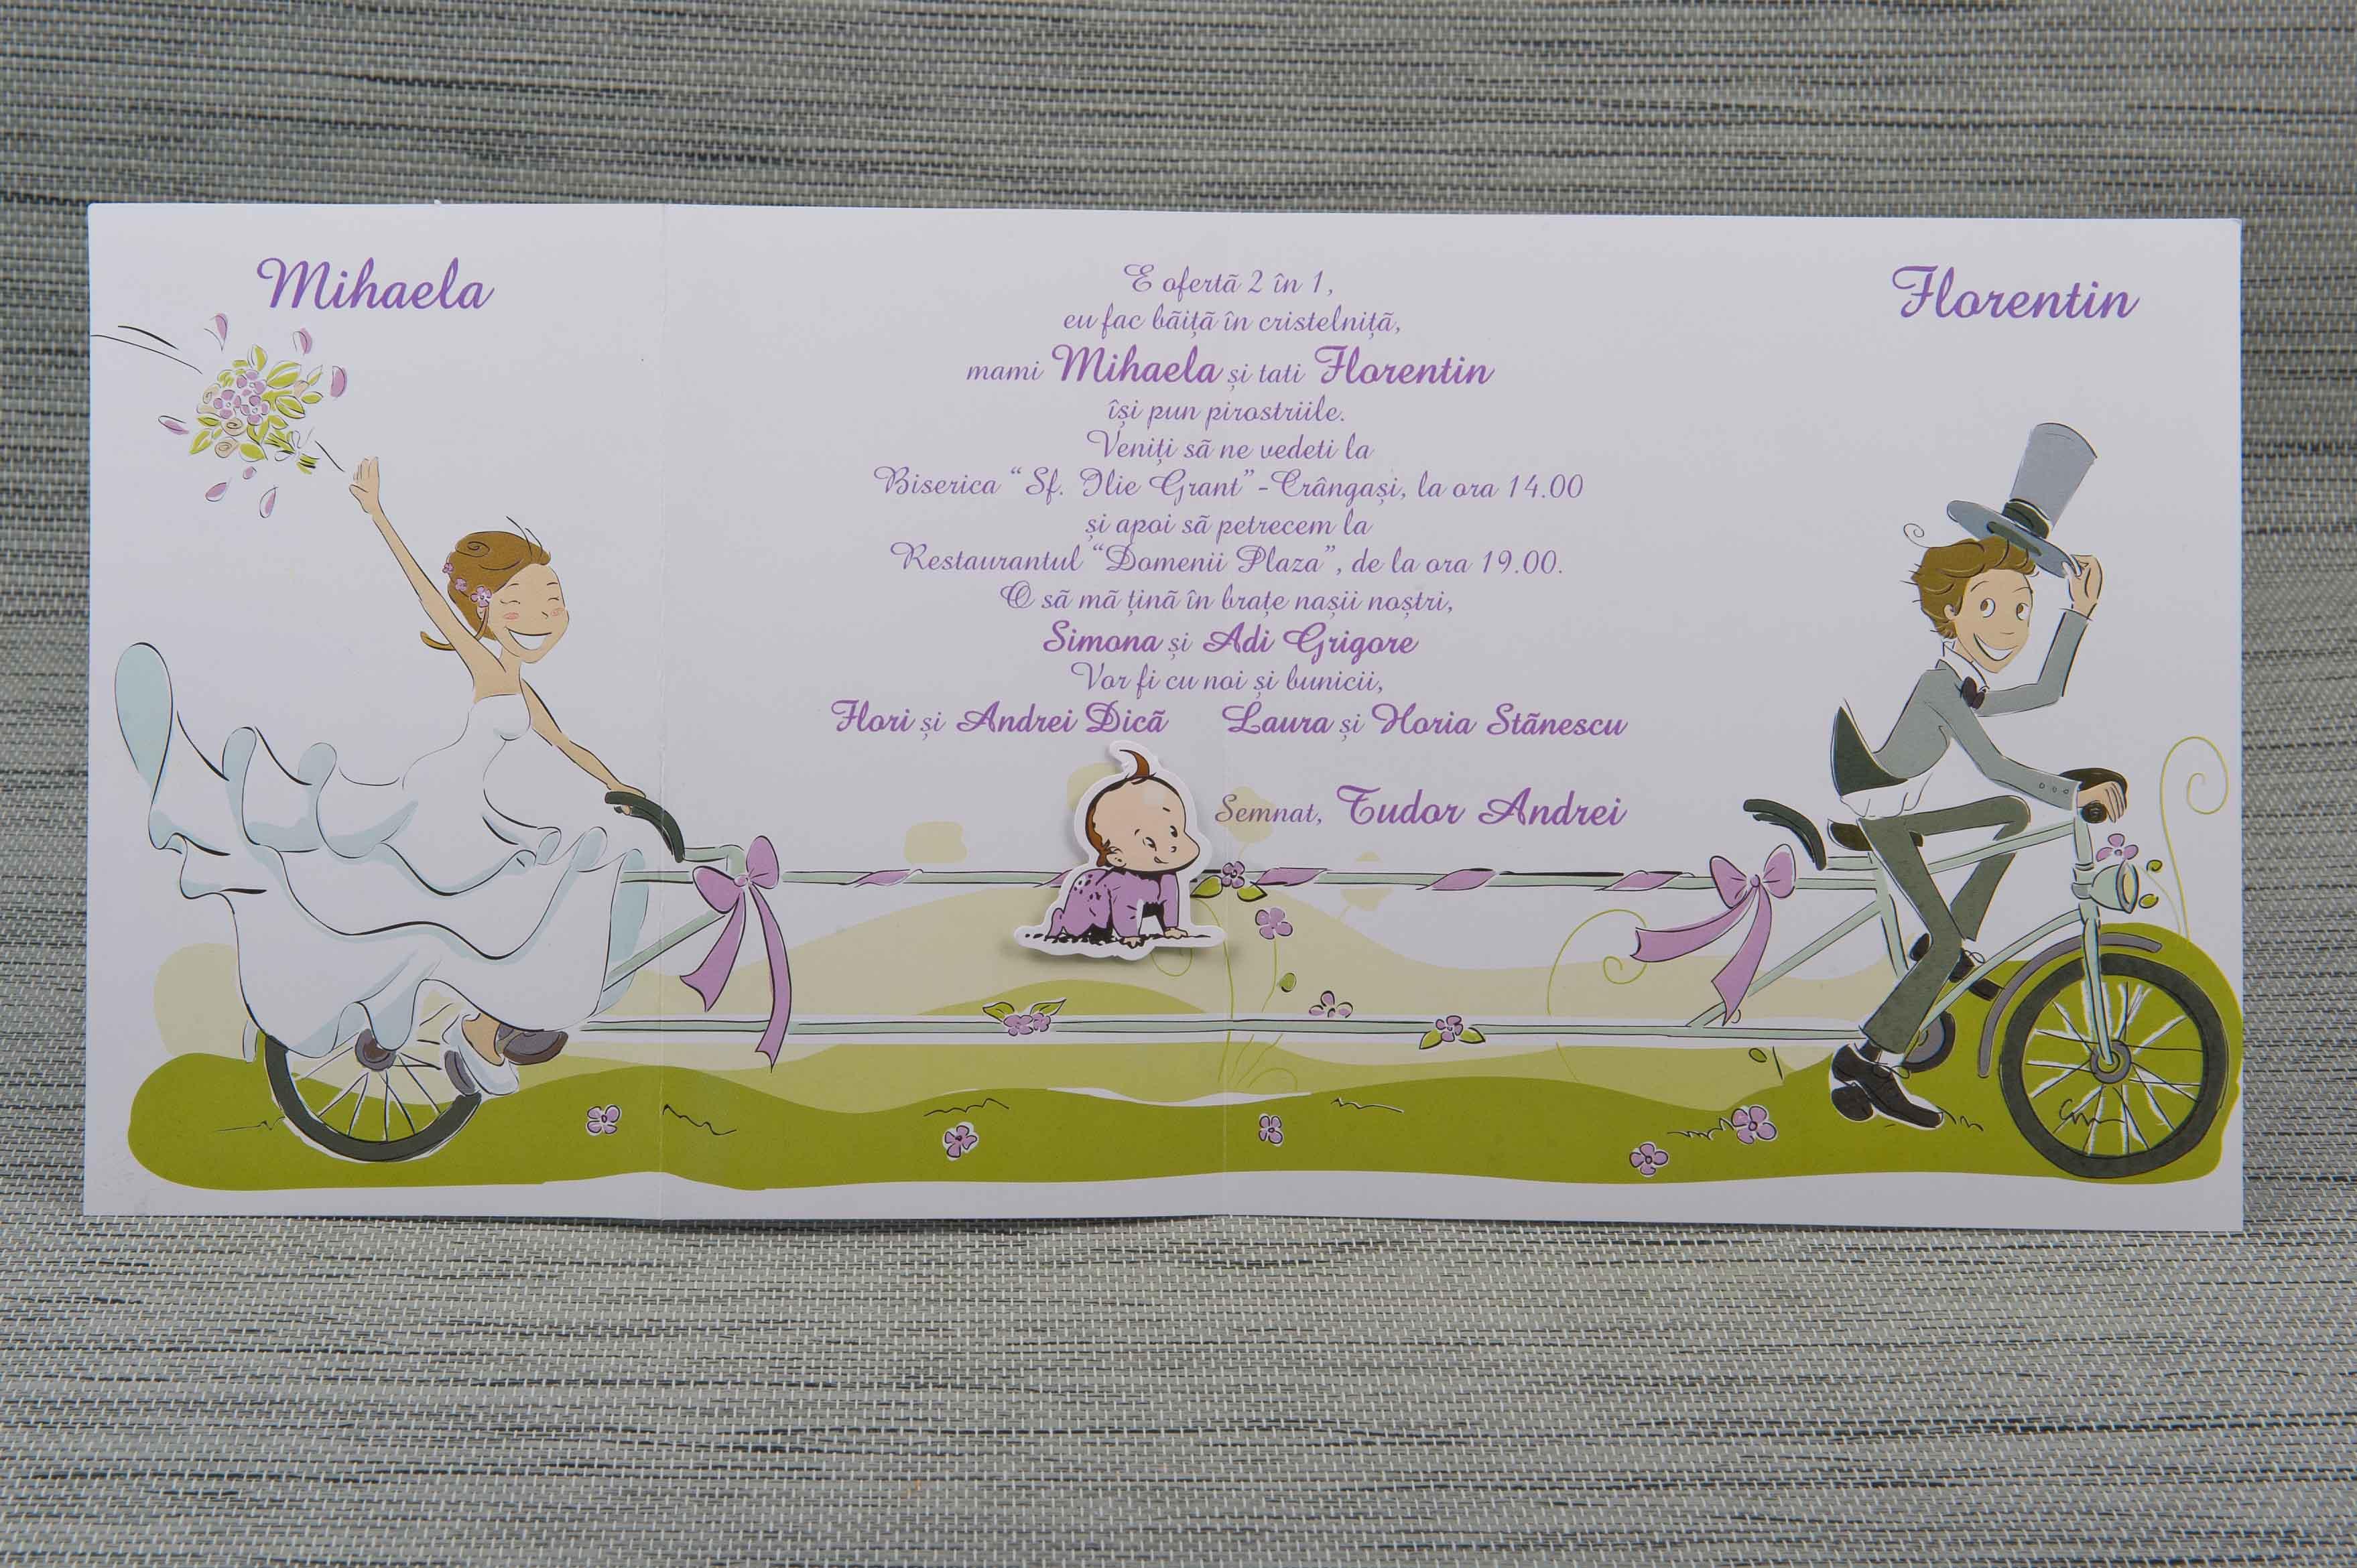 Invitatii Nunta Si Botez Invitatii Nunta Invitatii Botez Marturii